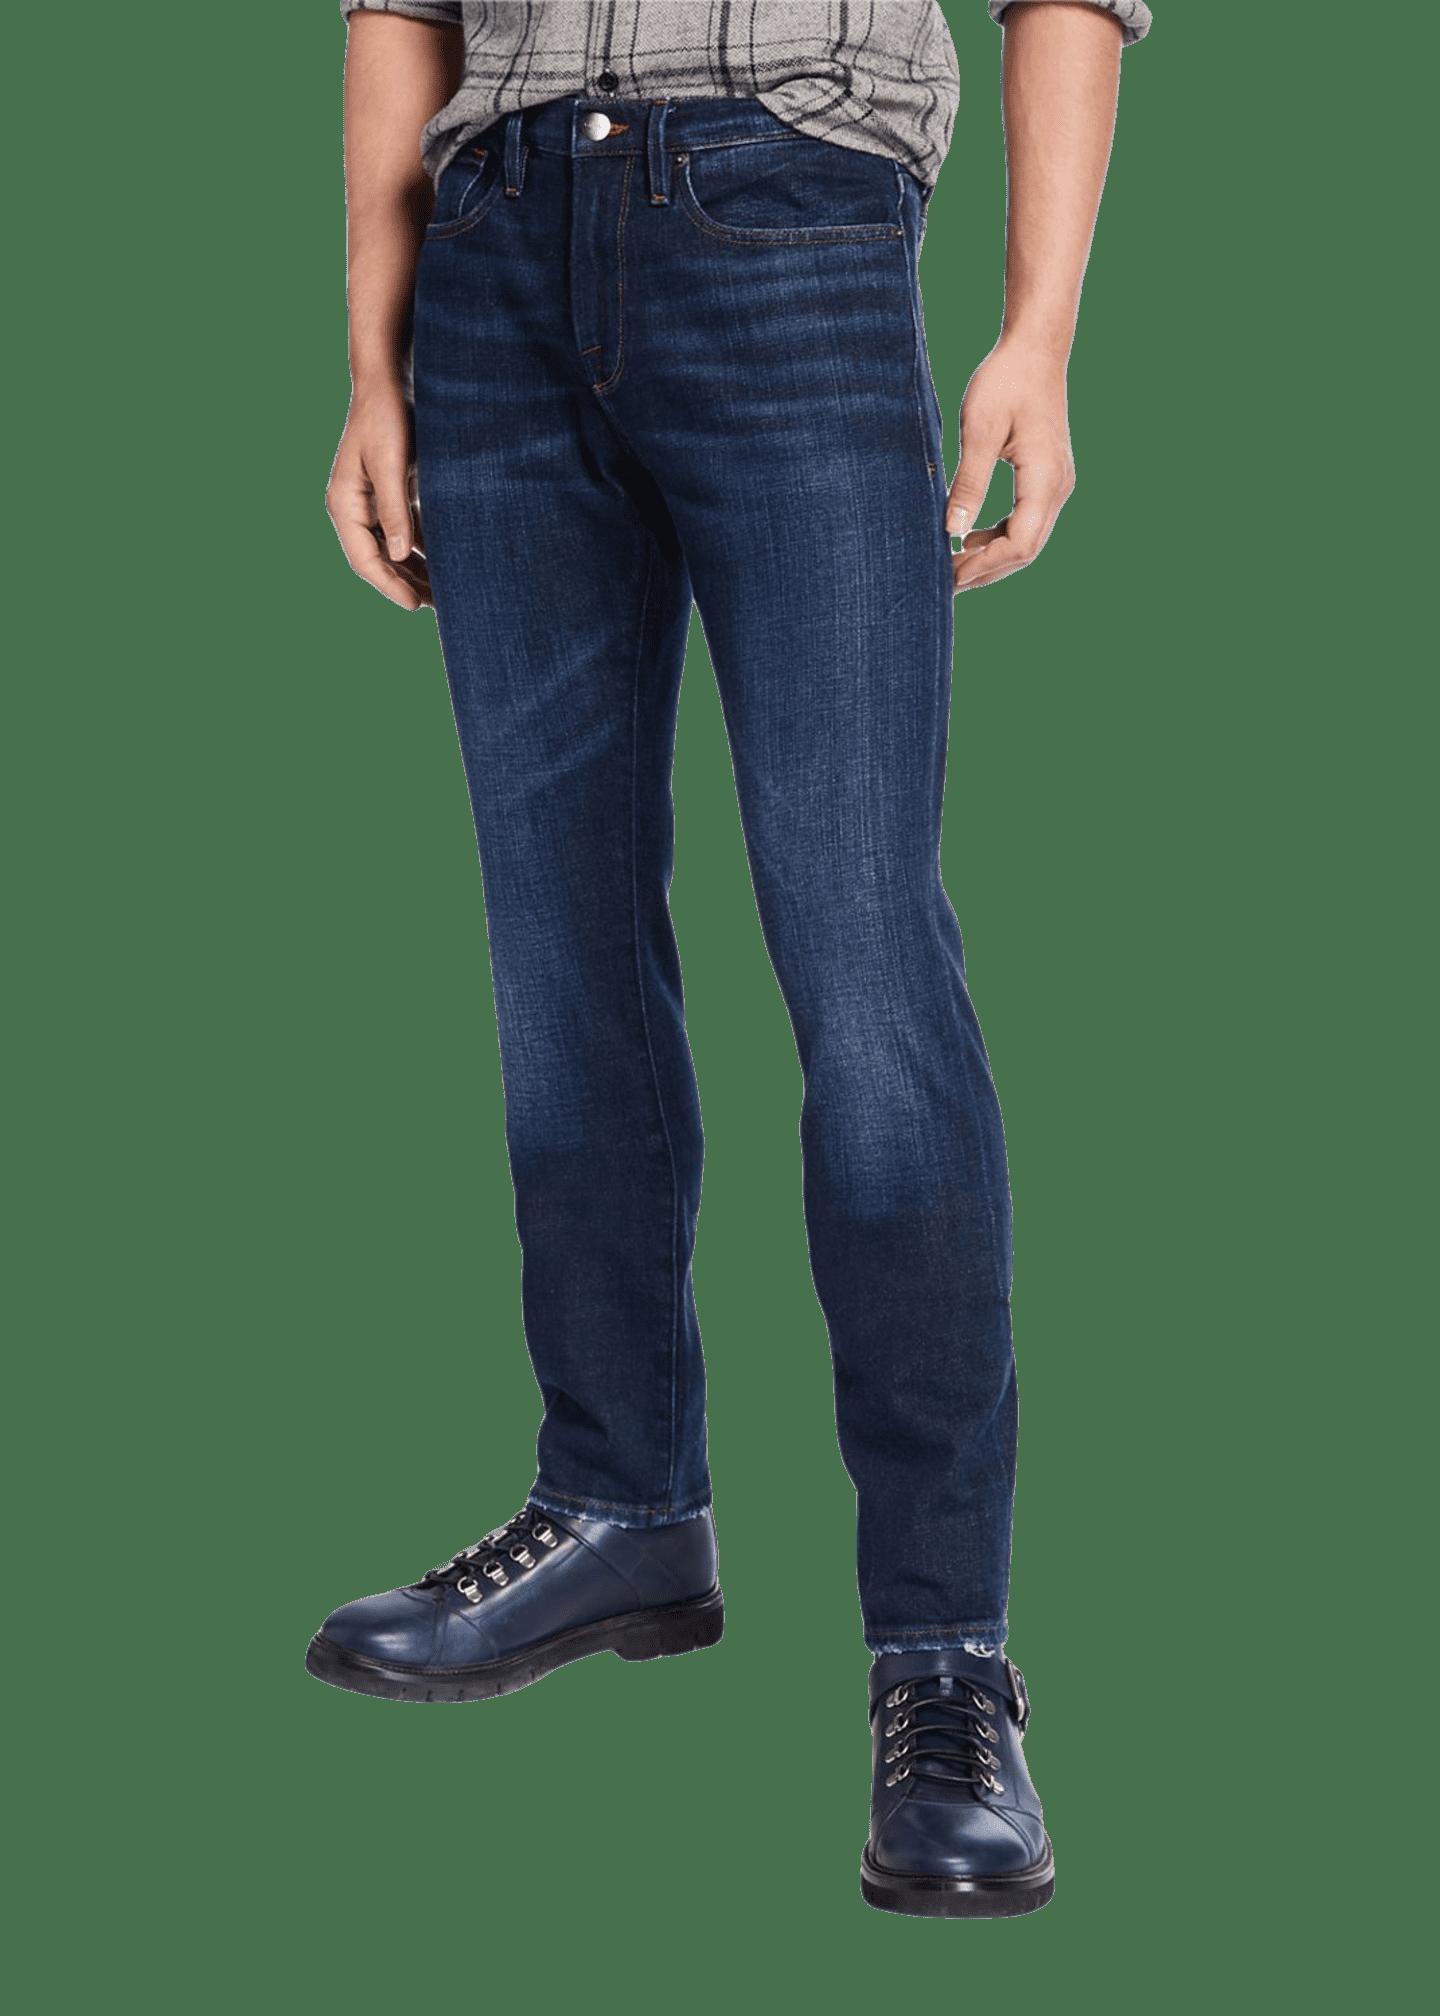 FRAME Men's L'Homme Slim Pullman Ripped-Knee Jeans